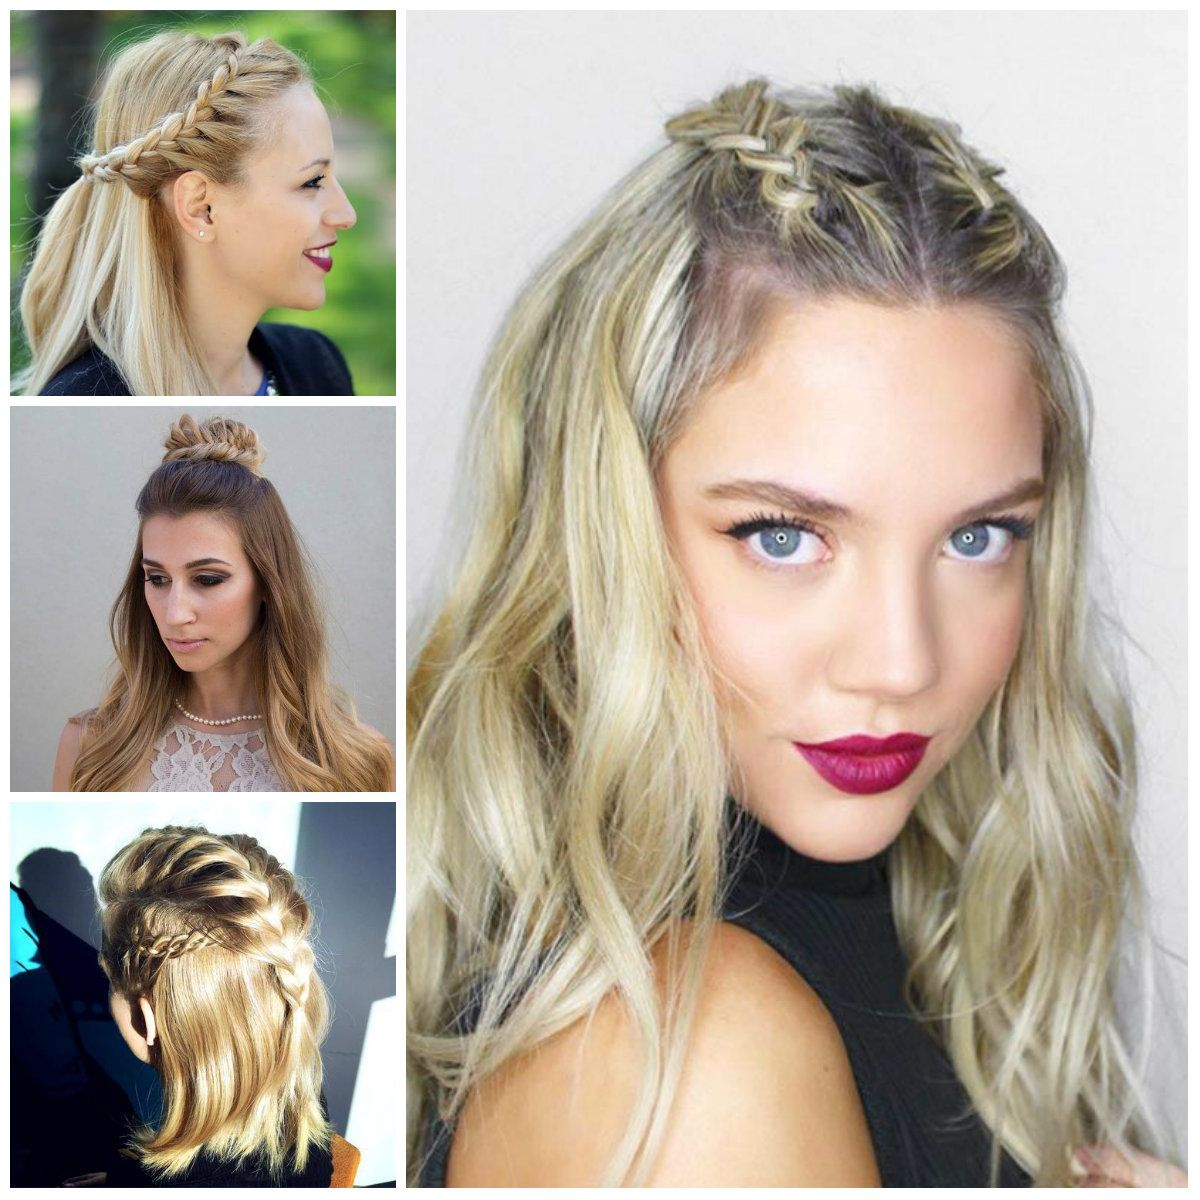 Braided Half Updo Hairstyles 2017 Hairstyles Pinterest Braided